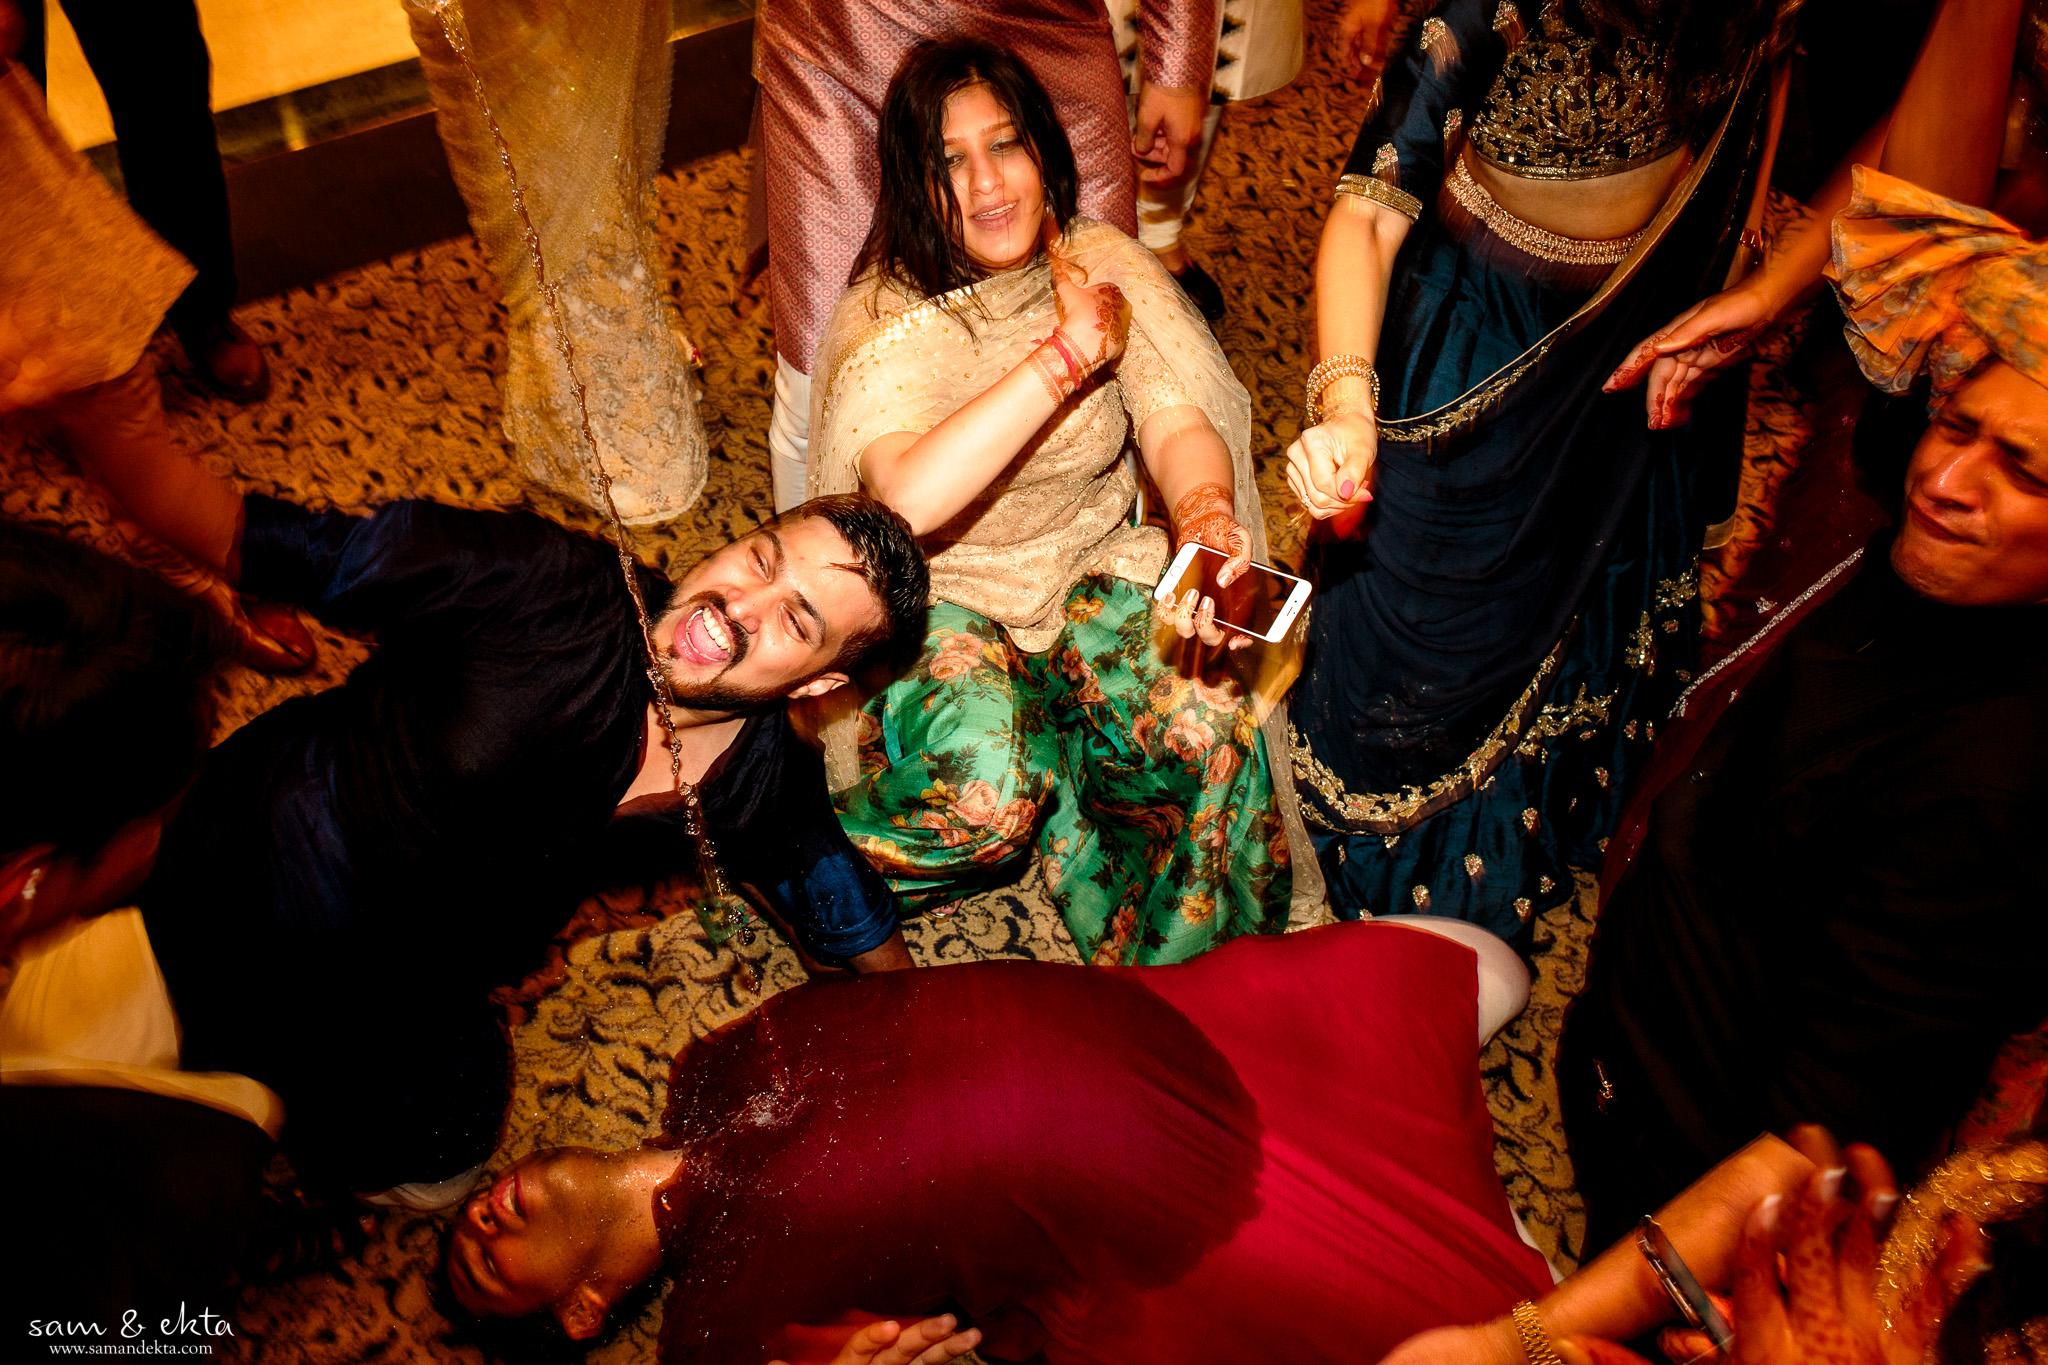 A&G_www.samandekta.com-80.jpg